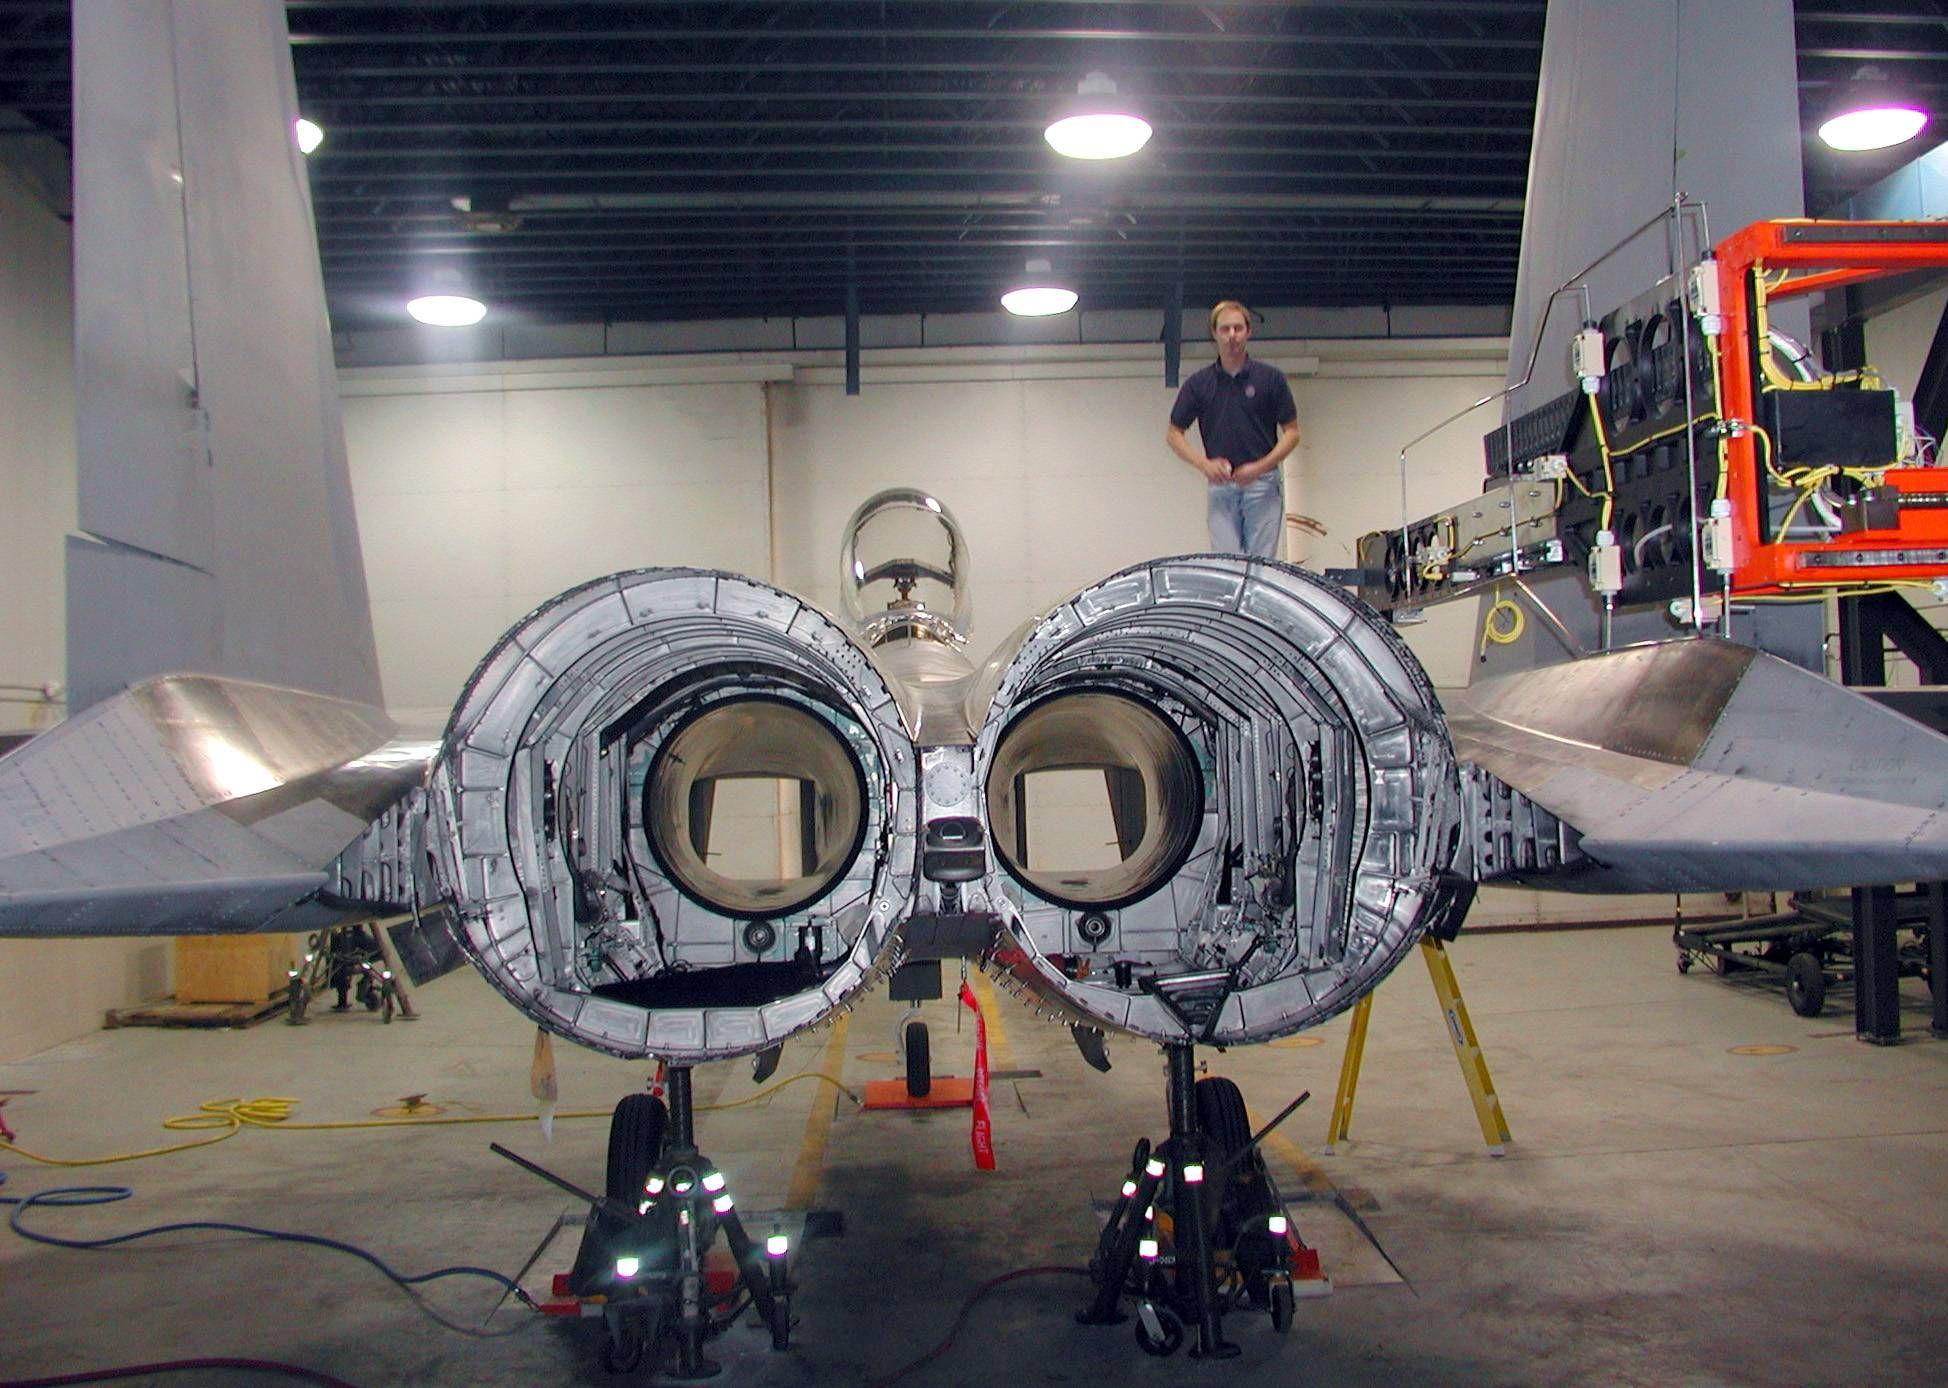 F-15QA: the most advanced Eagle ever - AR15 COM